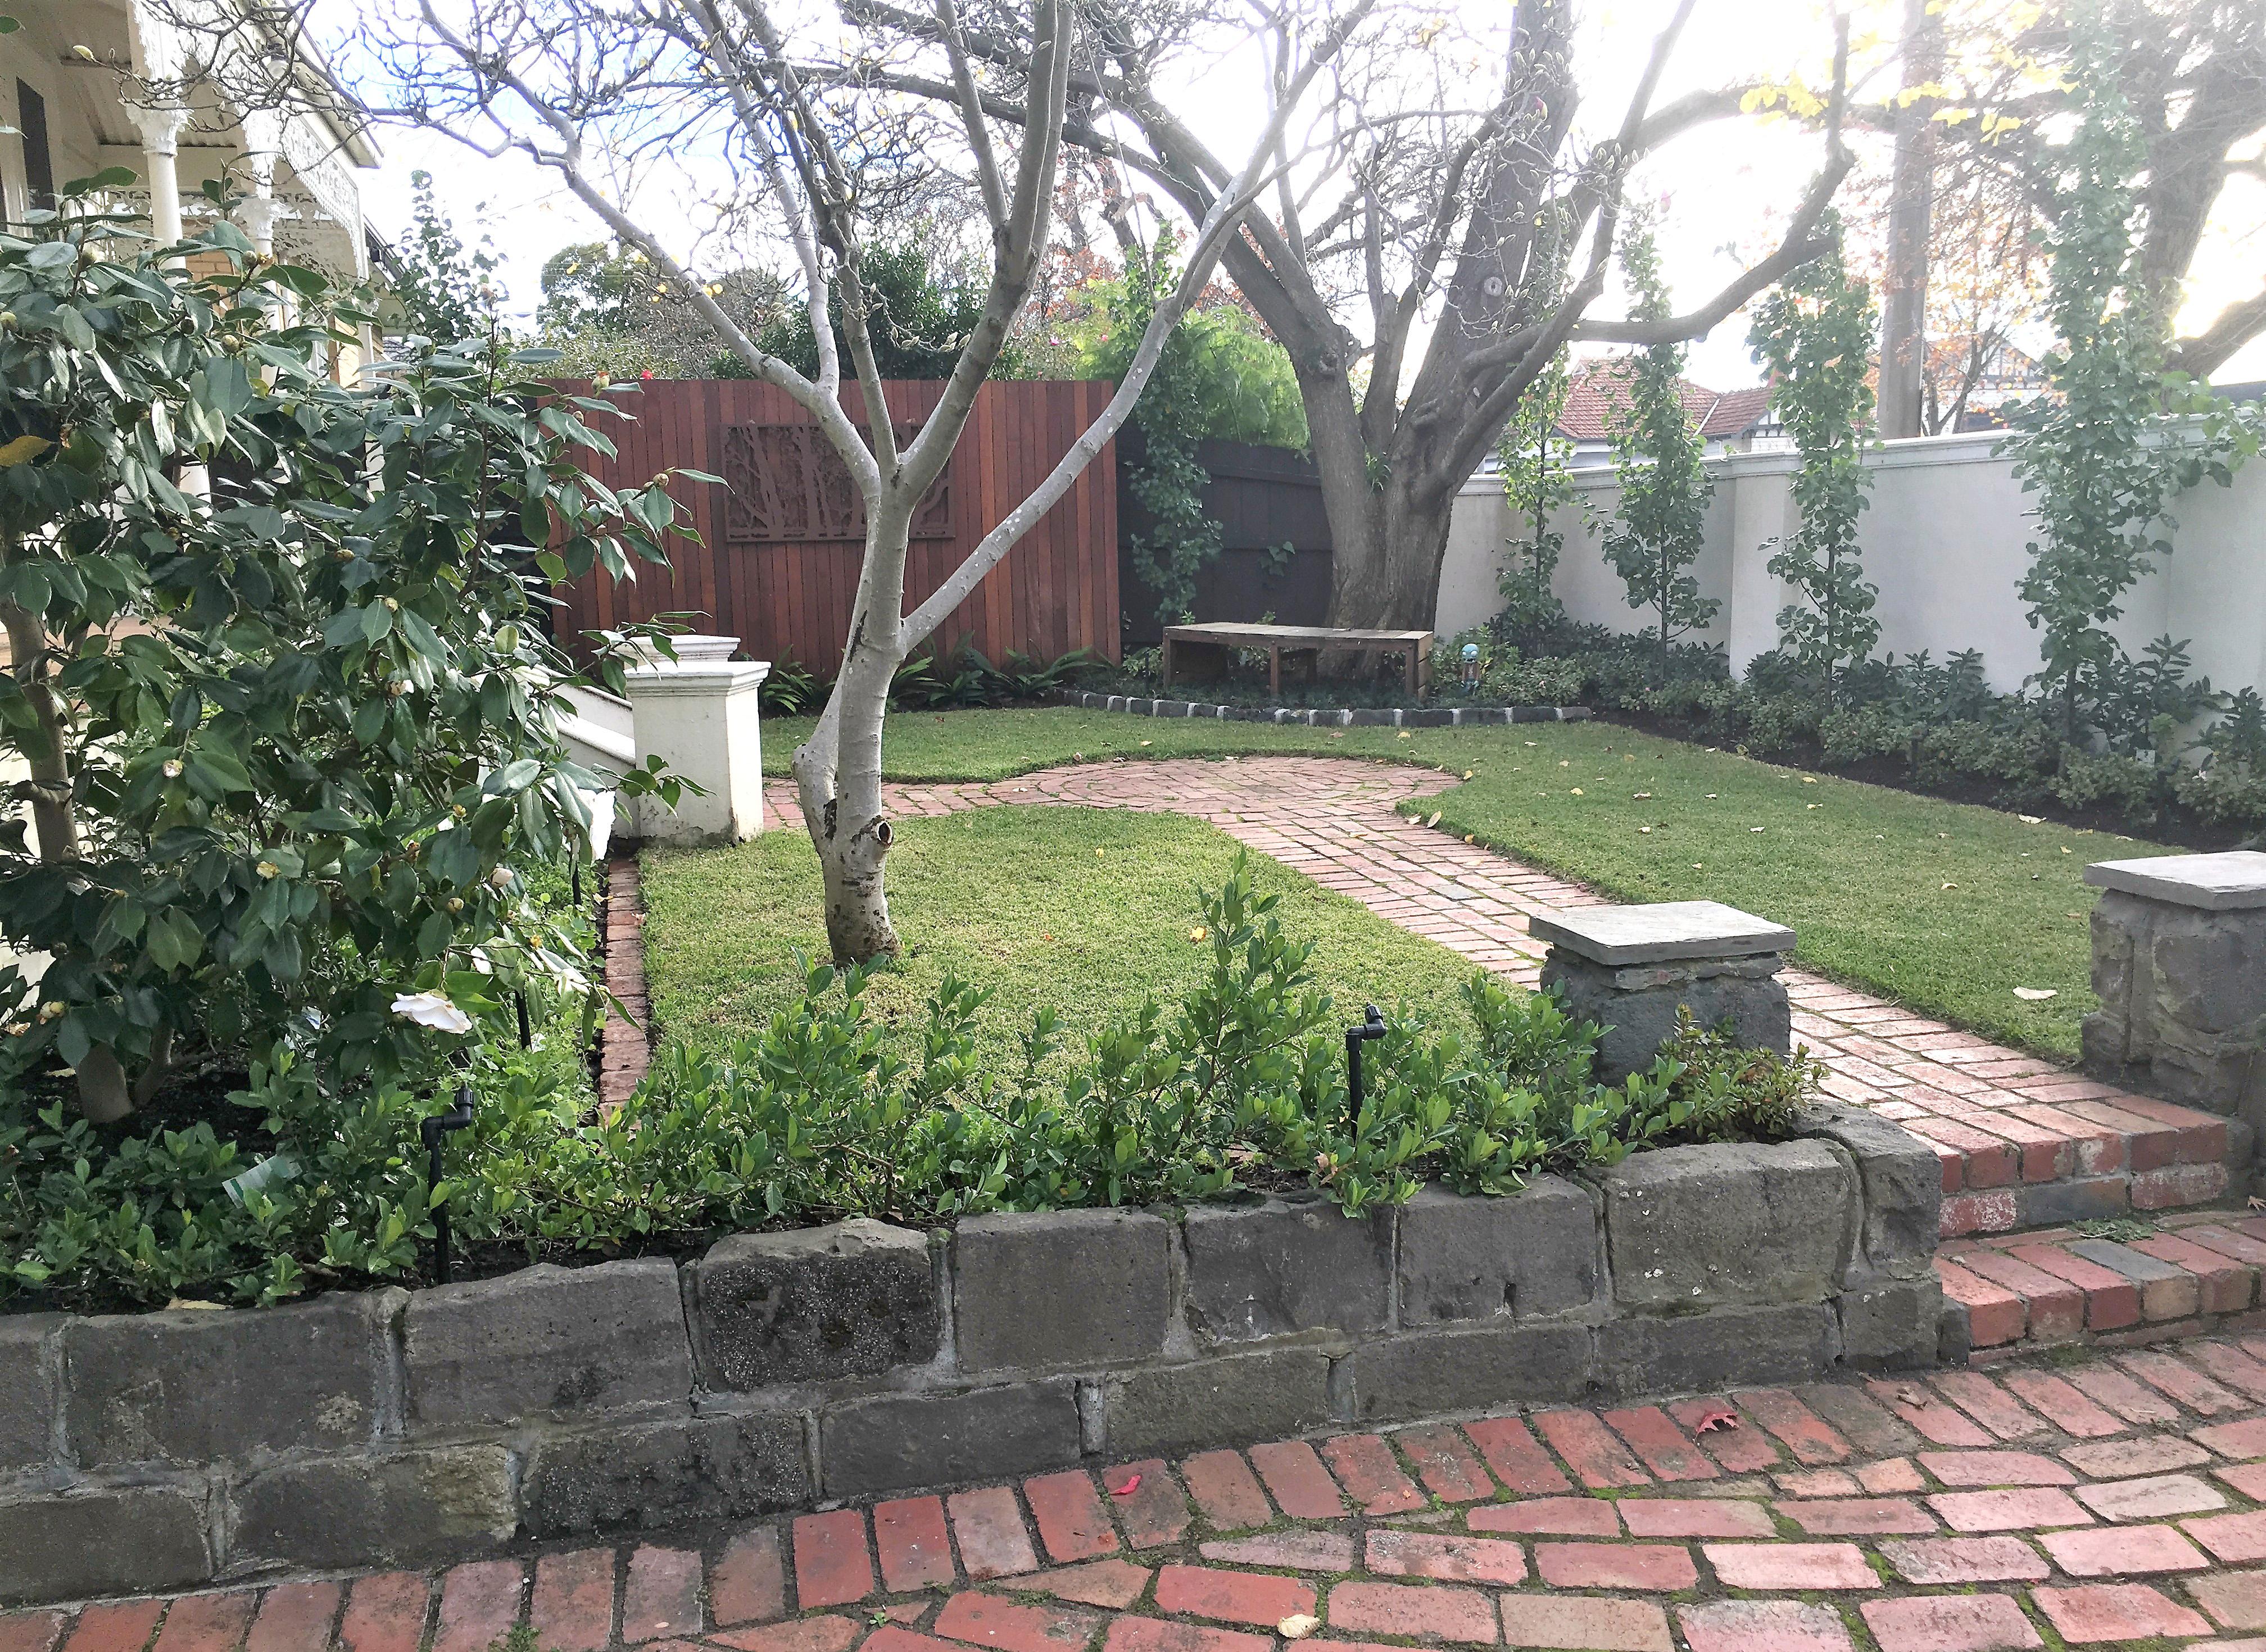 Landscape construction forever green landscaping melbourne for Landscape construction melbourne